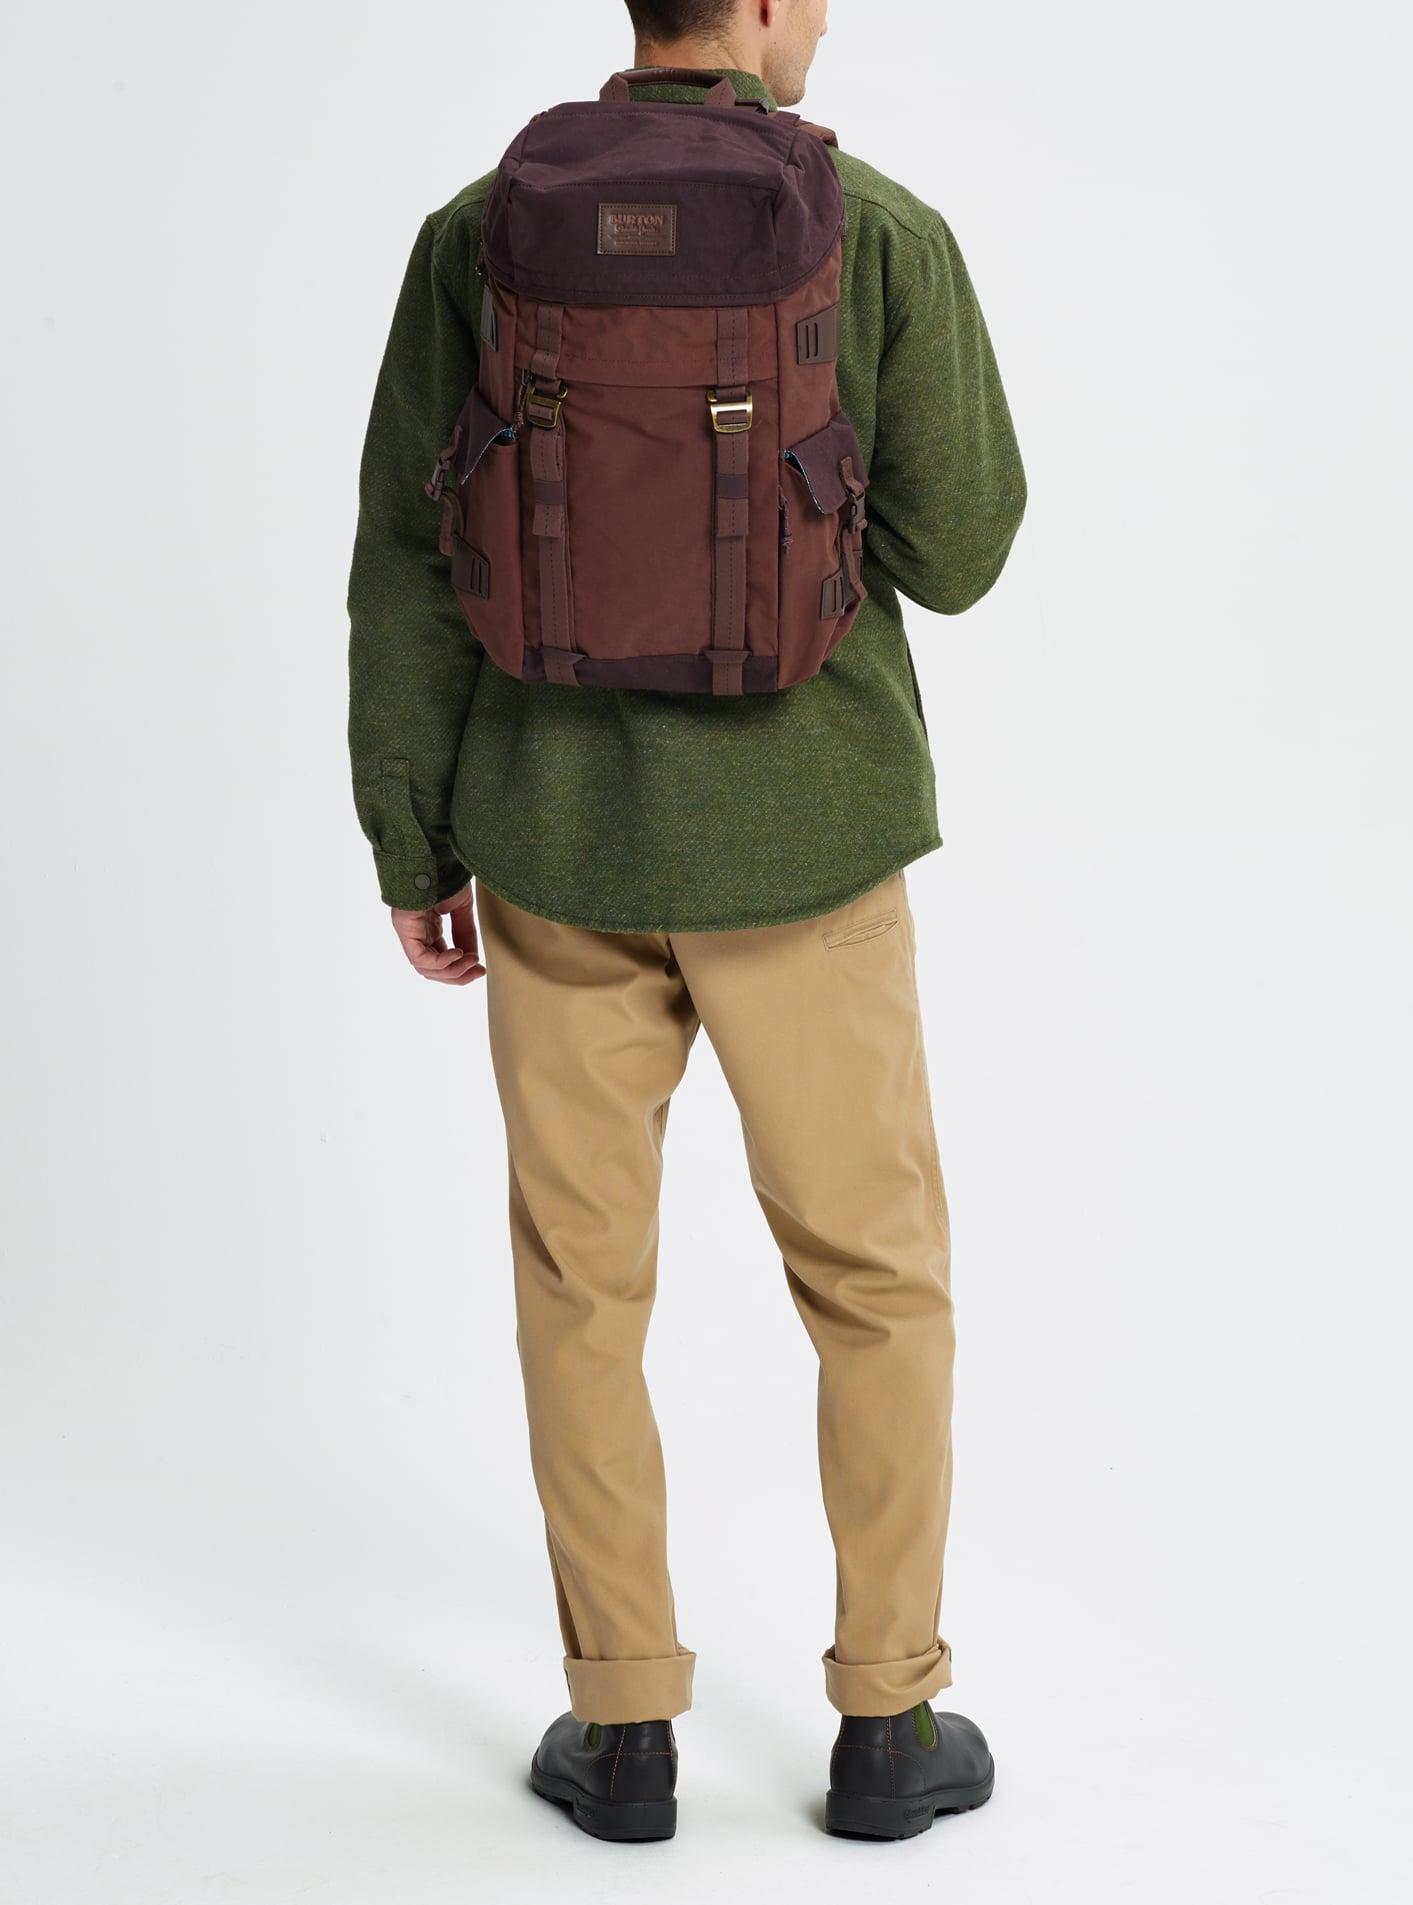 c1236ef8ed6e1 Burton Annex Backpack